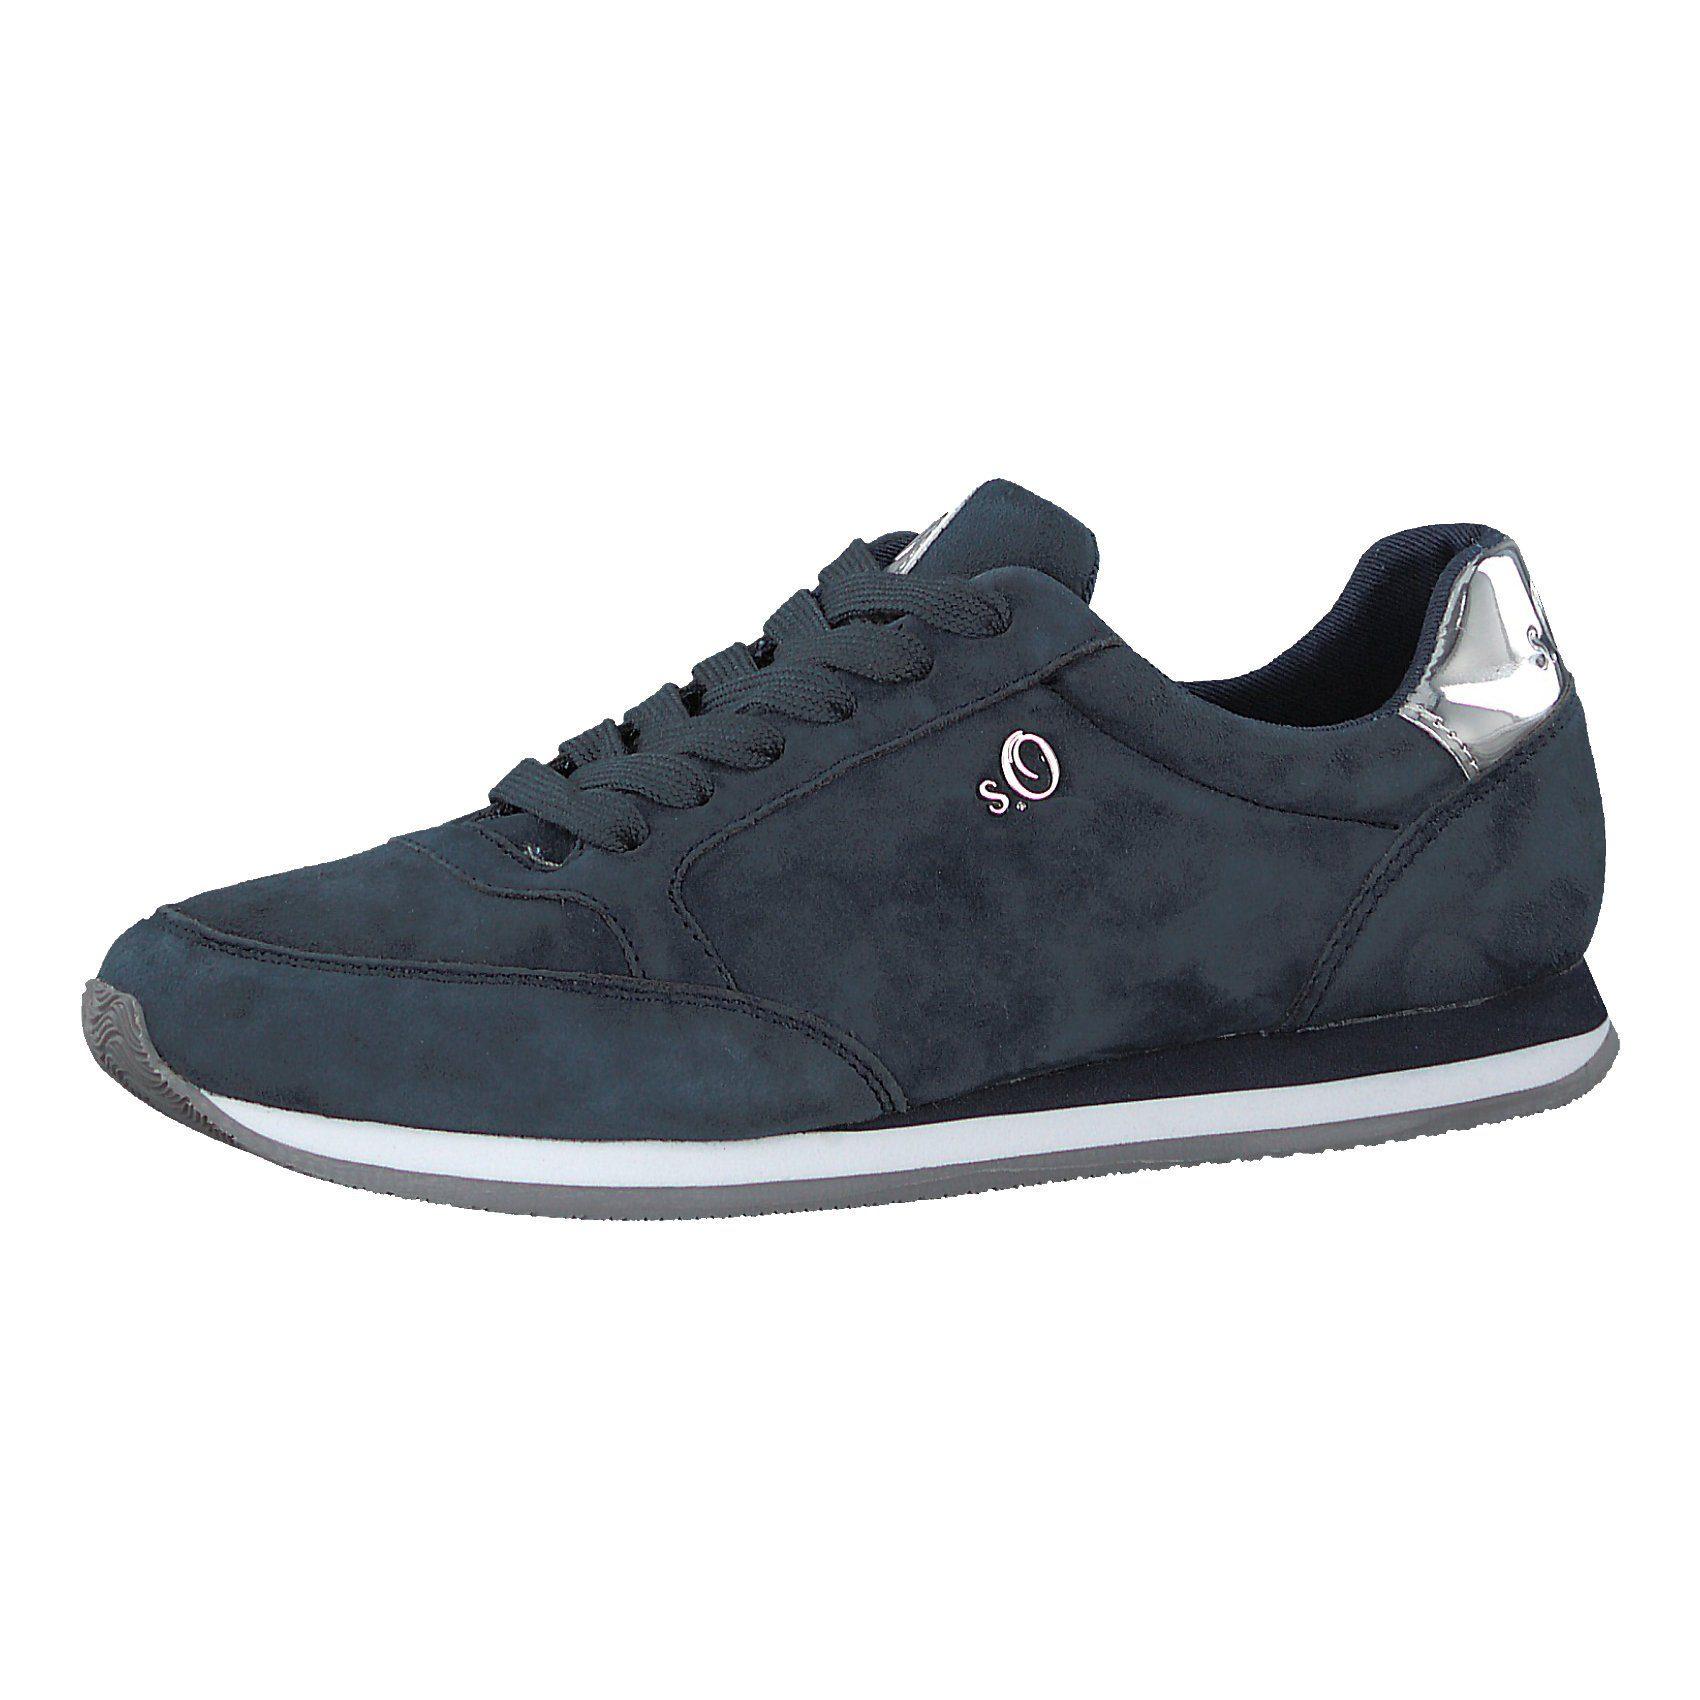 sOliver Sneakers Low online kaufen  blau